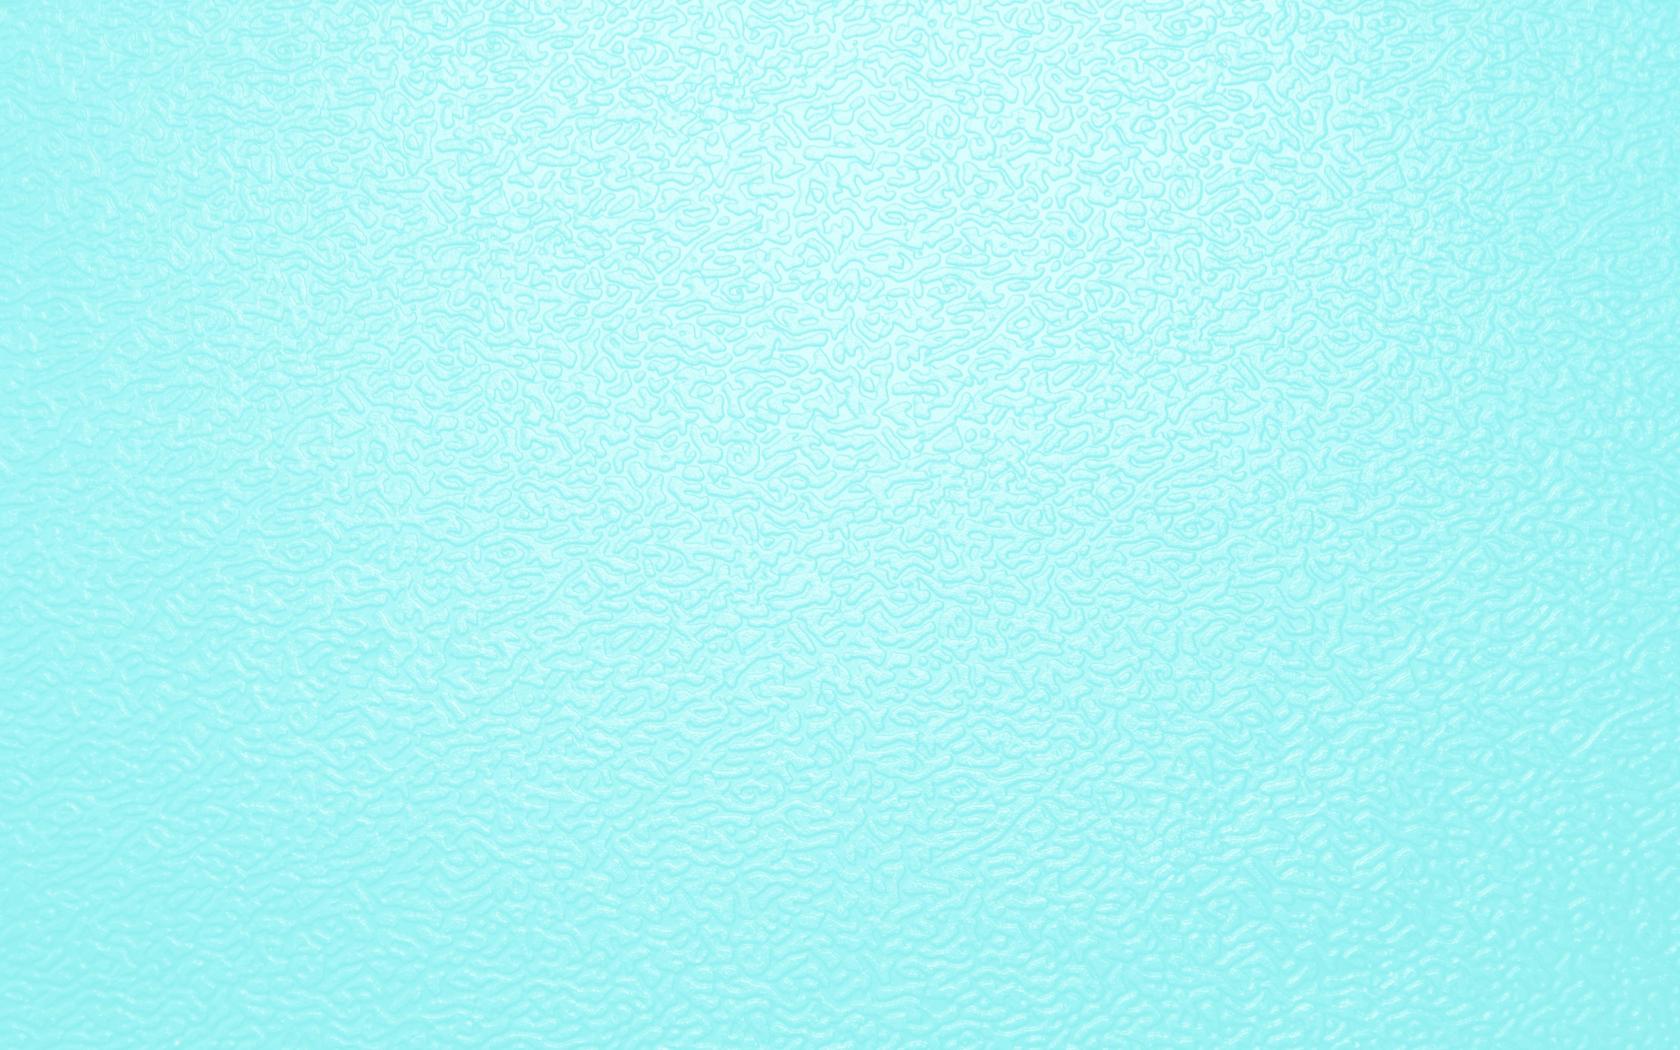 Картинка светло синего цвета